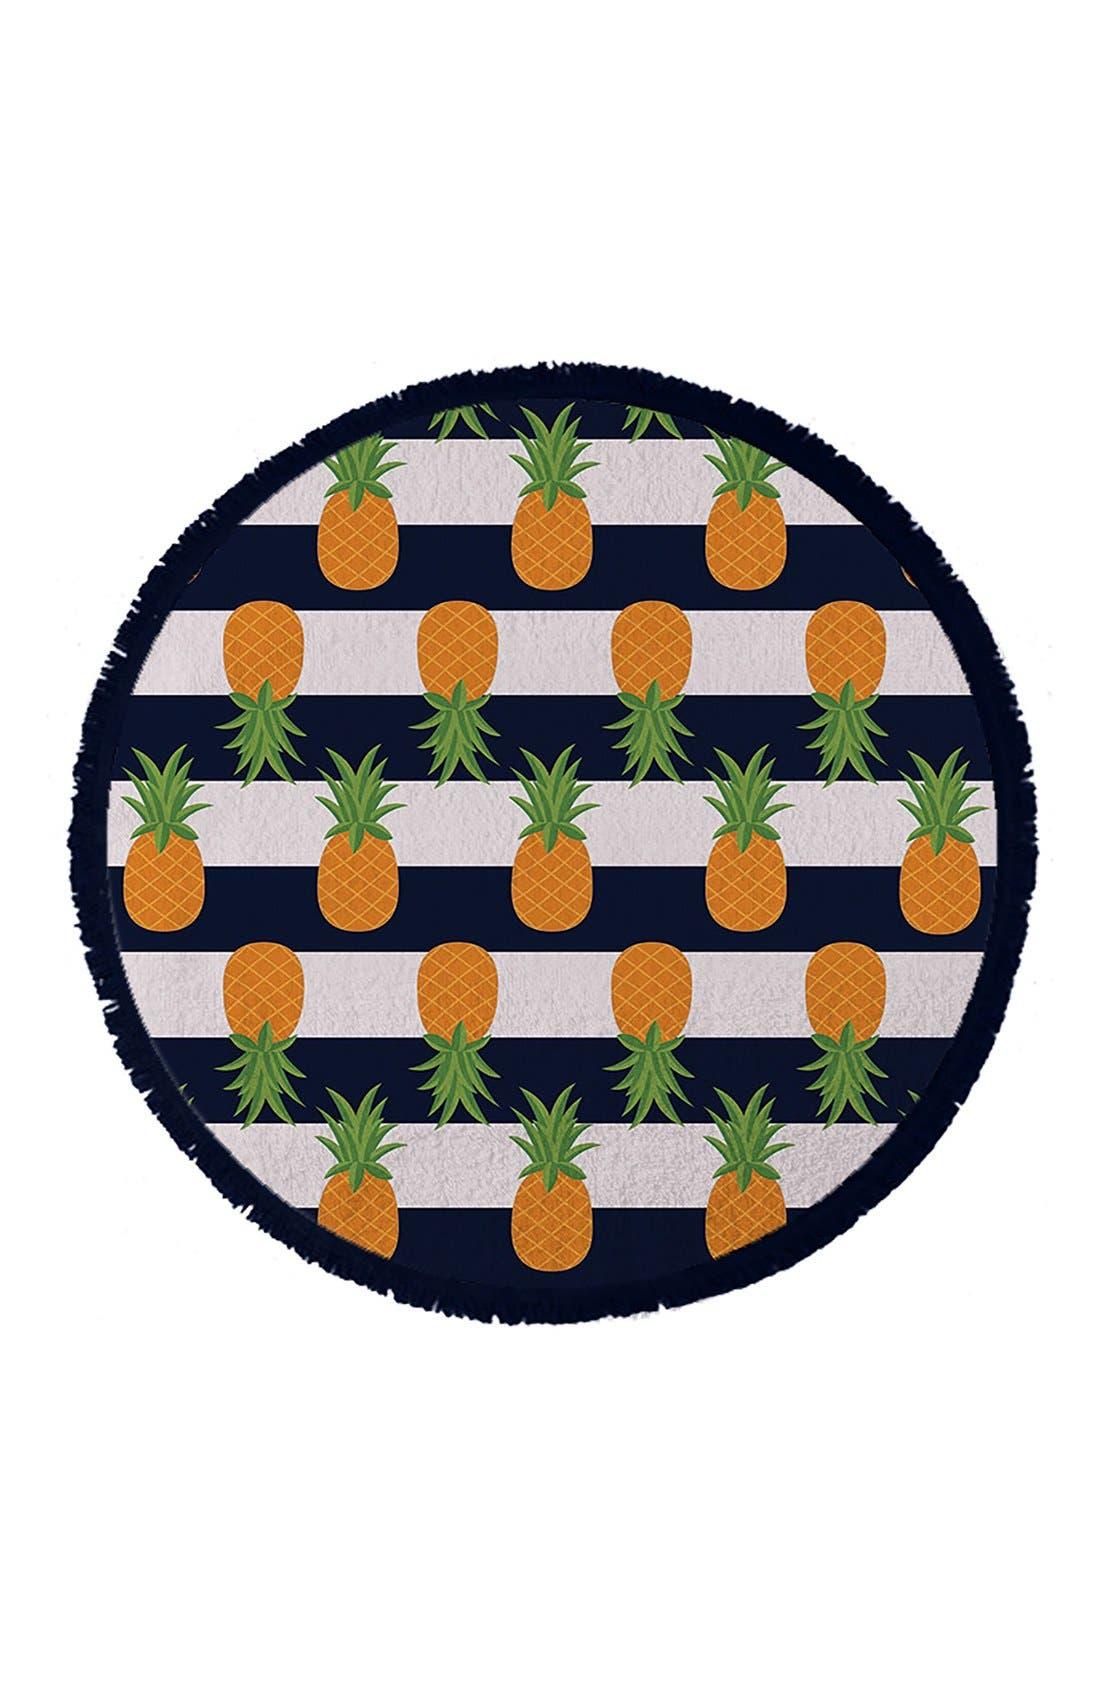 Round Towel Co. Nautical Pineapple Towel